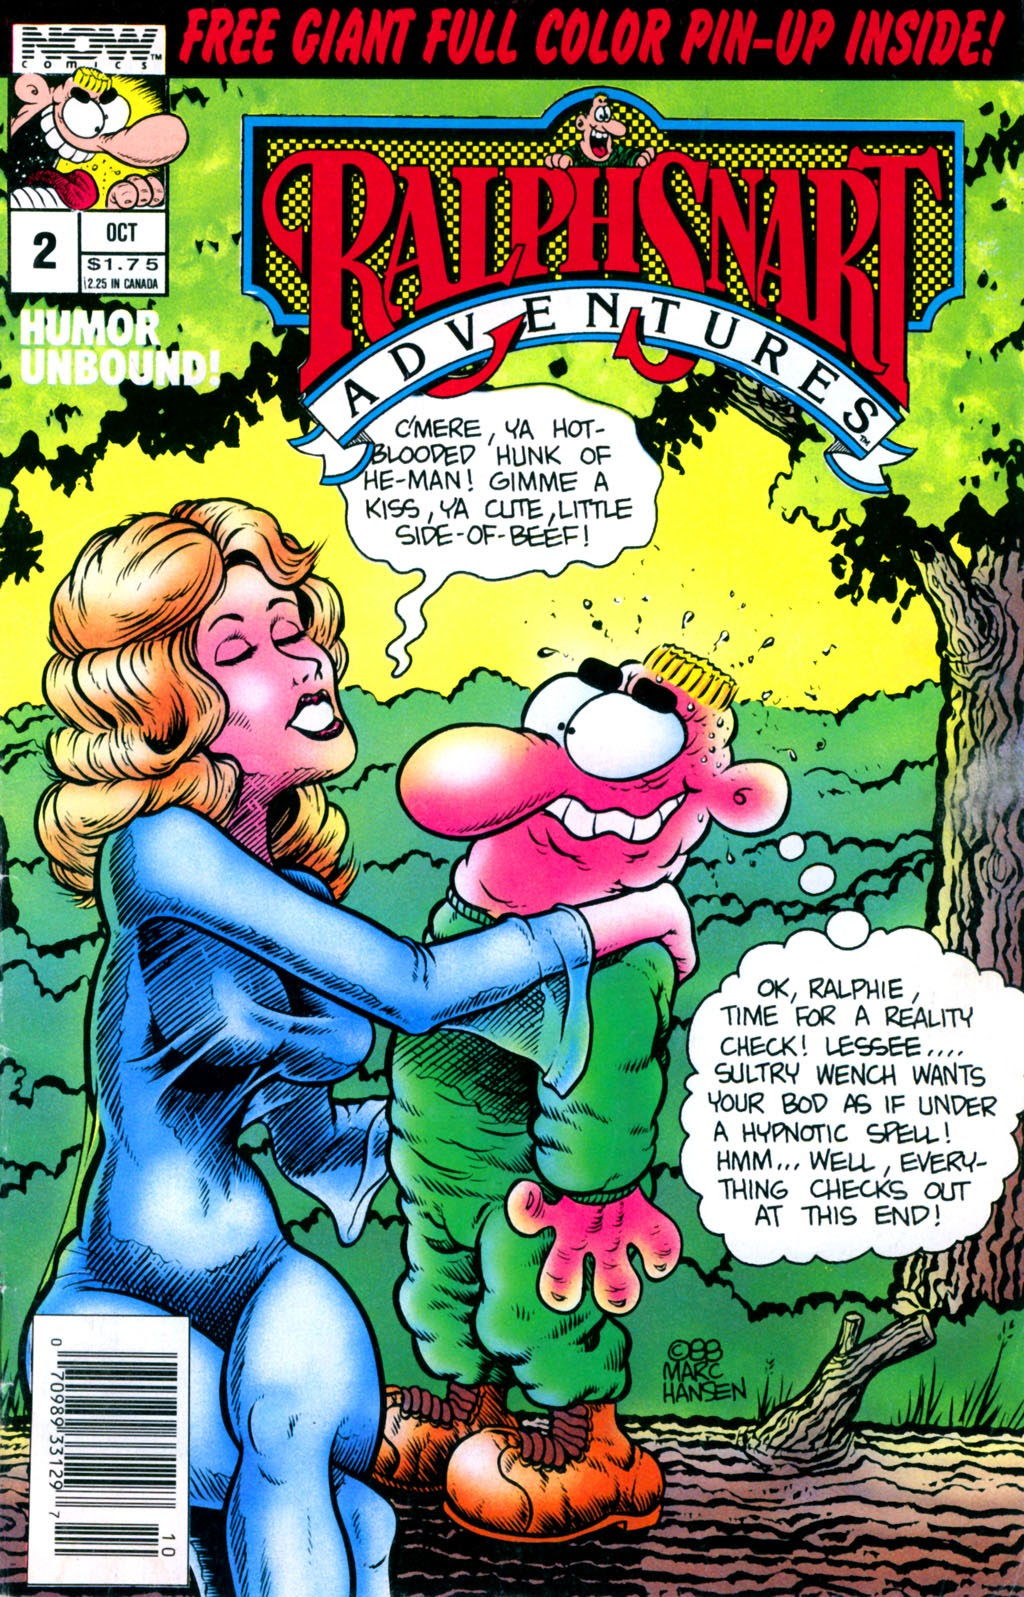 Ralph Snart Adventures (1988) 2 Page 1